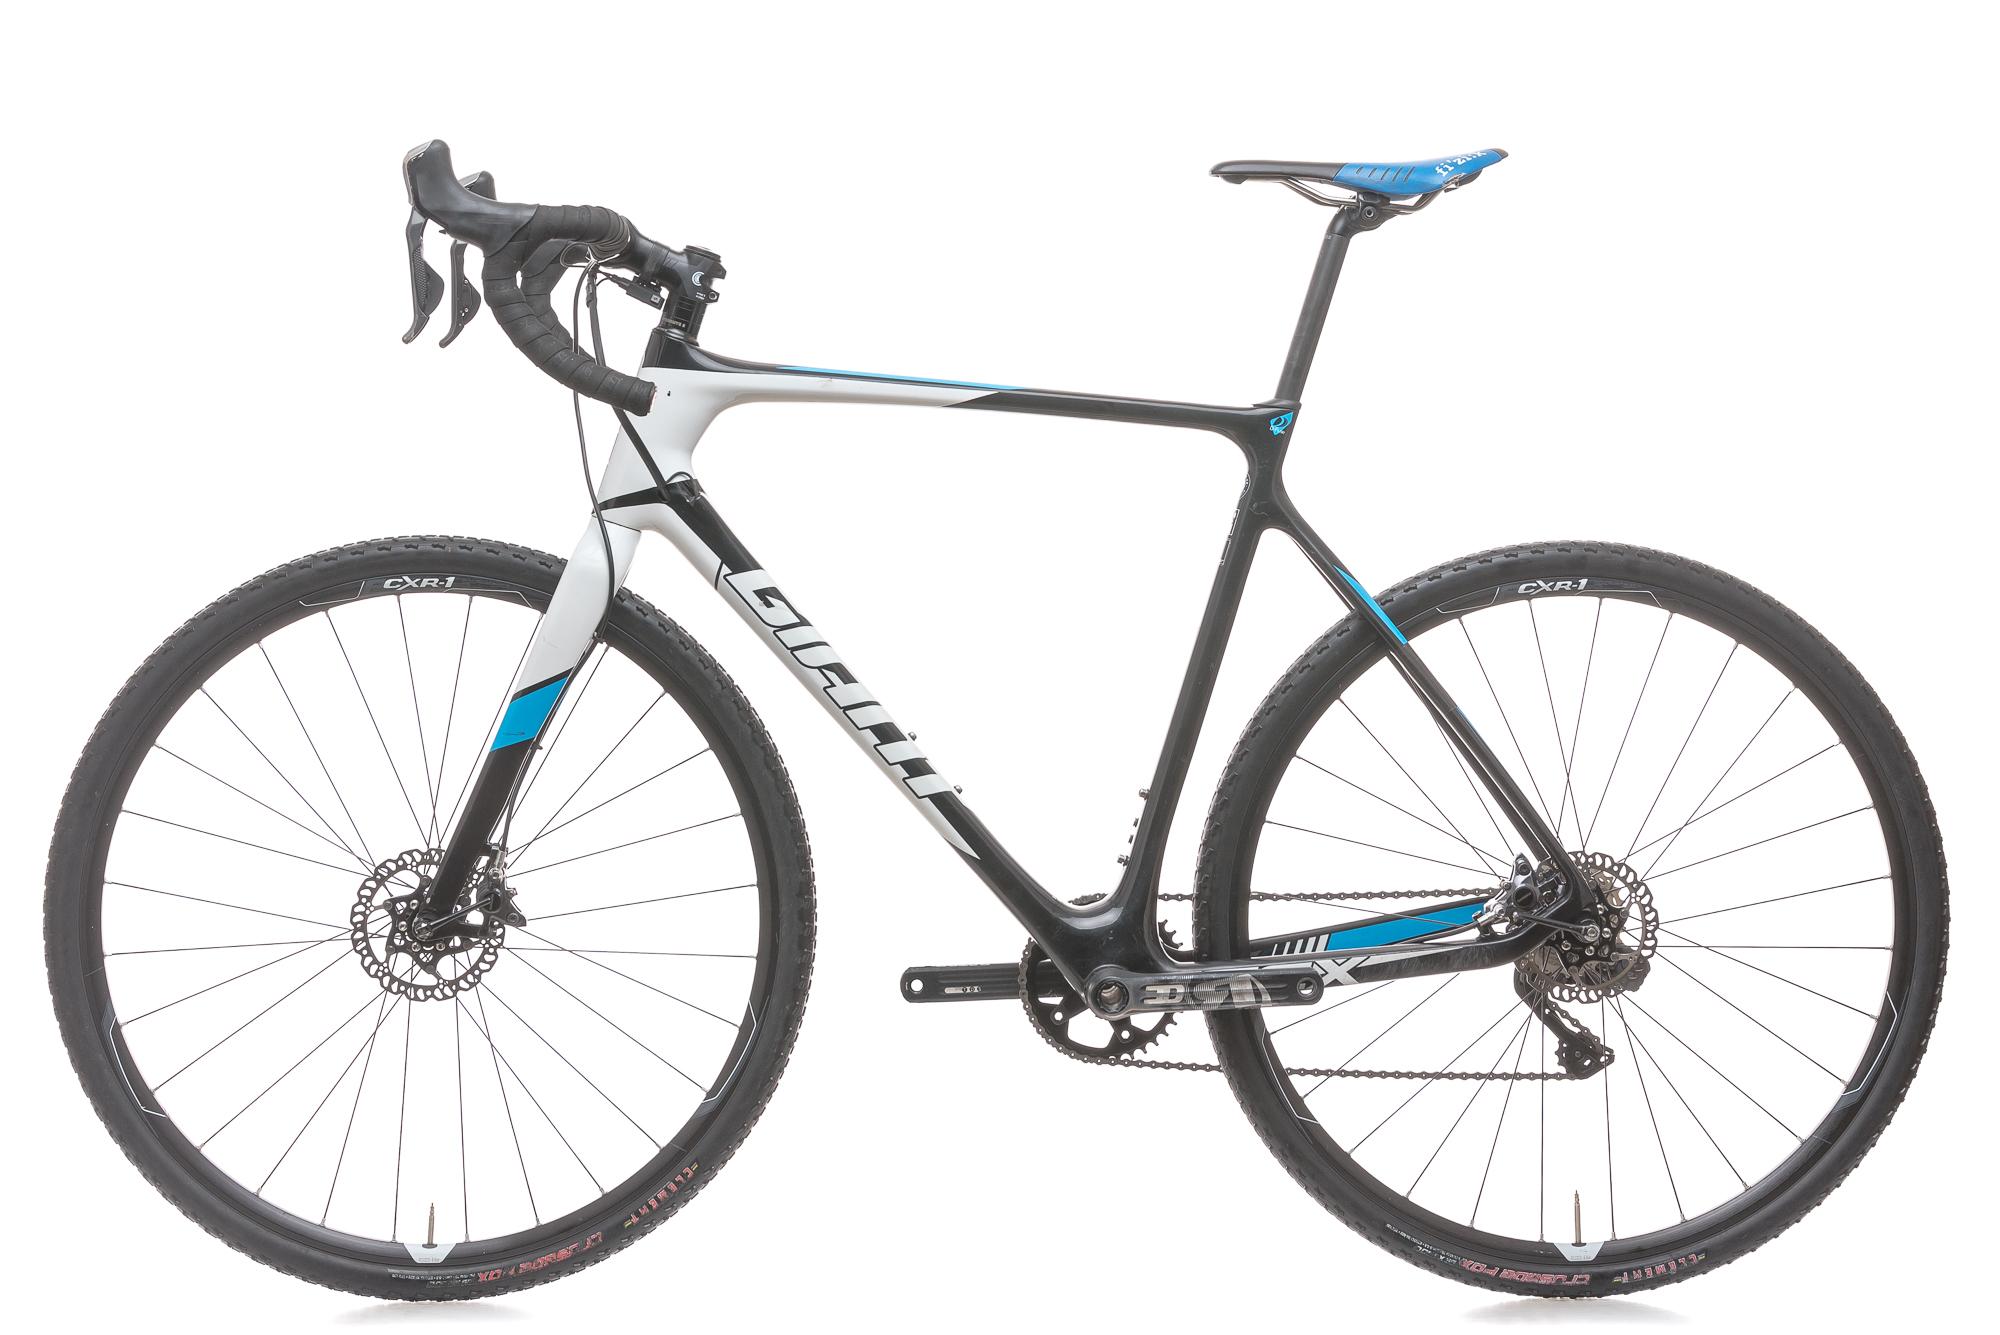 2016 Giant Tcx Advanced Pro 1 Cyclocross Bike Large Carbon